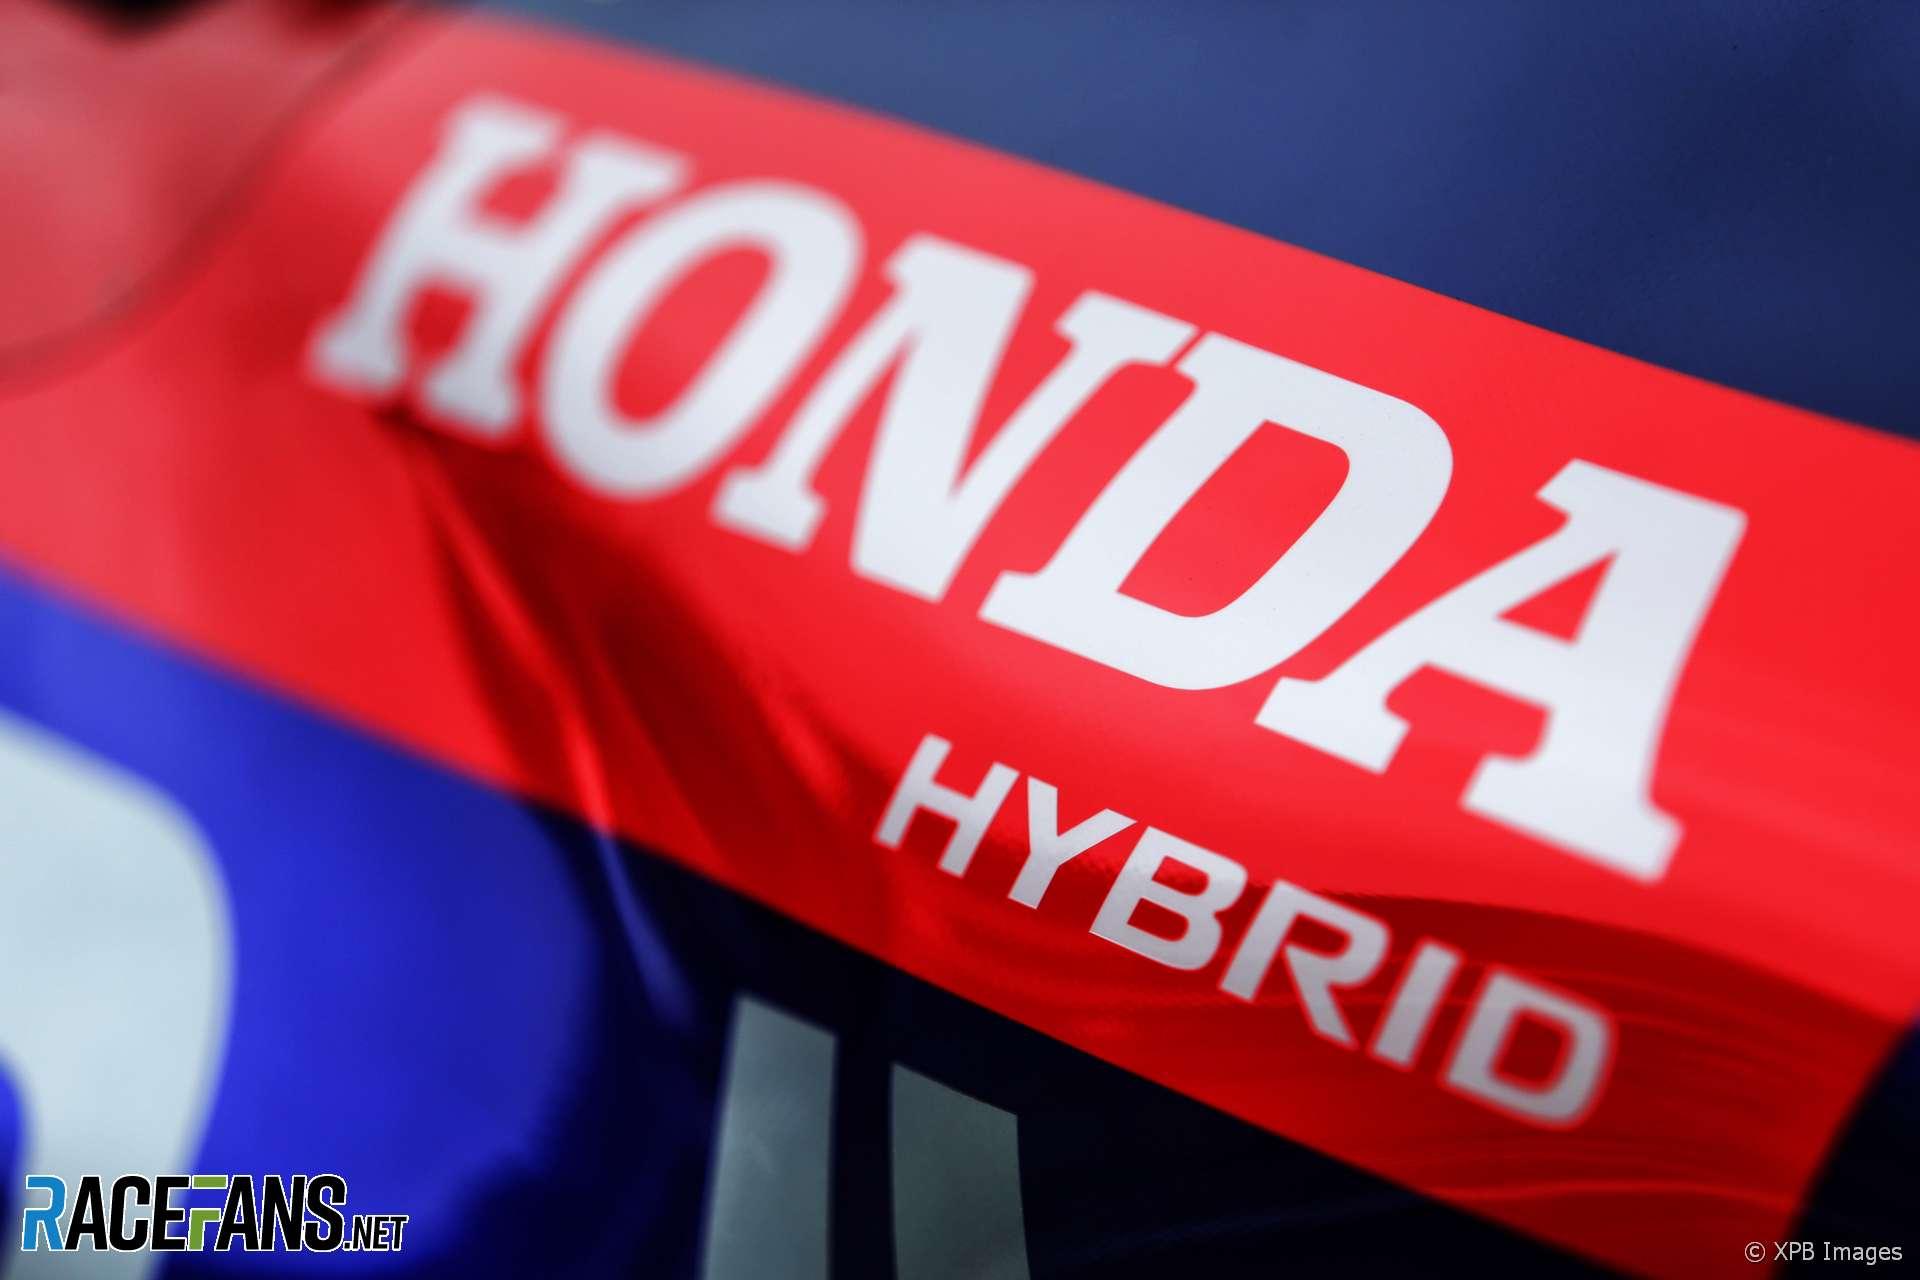 Toro Rosso-Honda, Interlagos, 2018